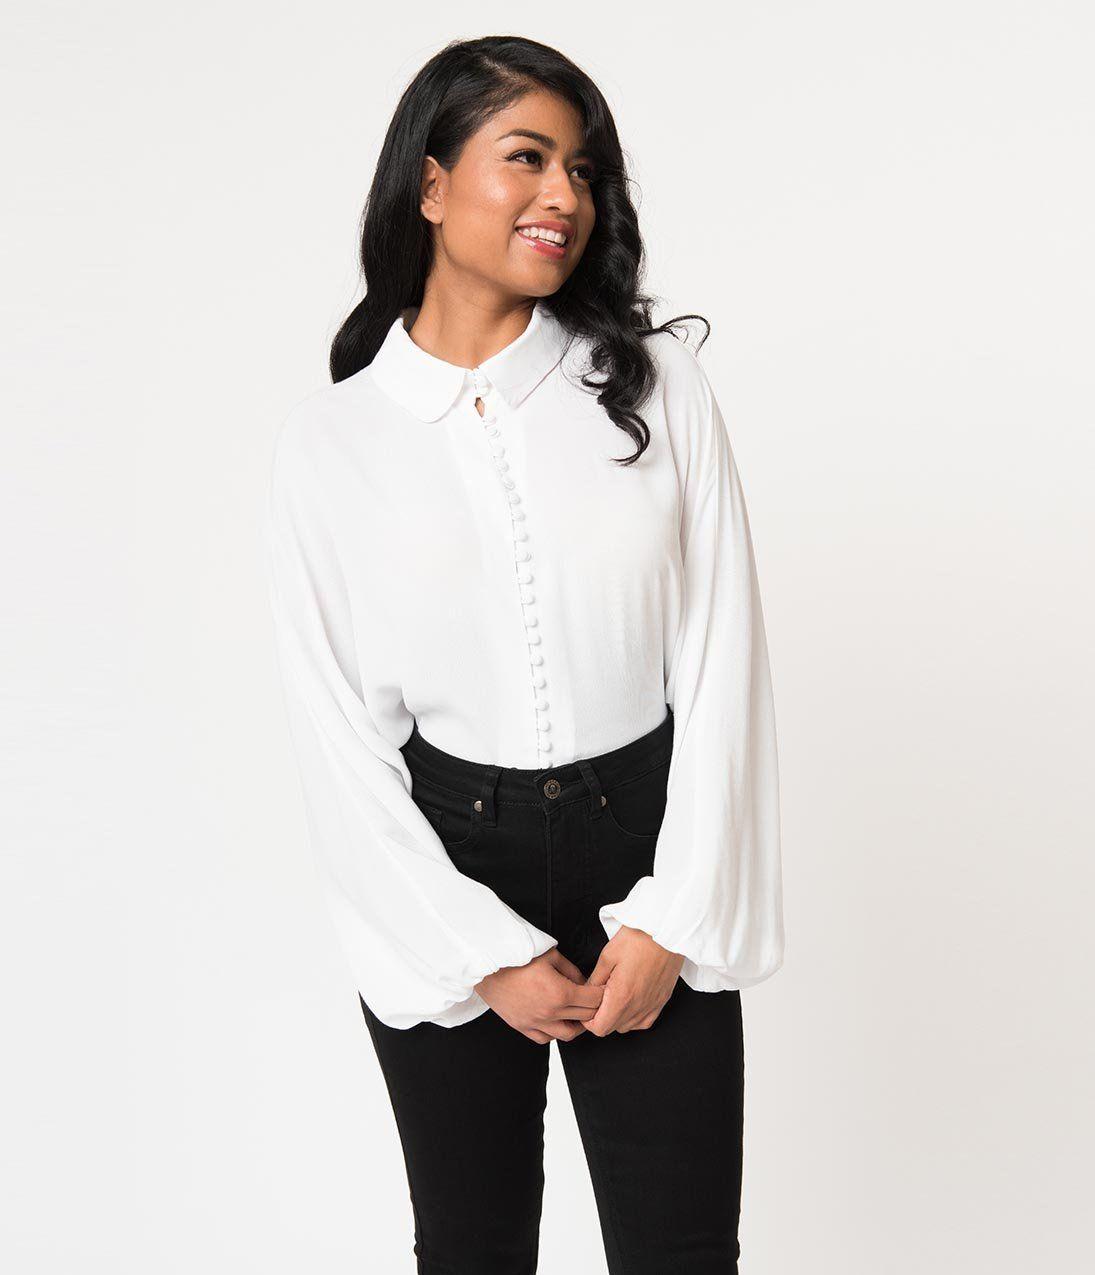 b77eaa72b82e Vintage Style White Button Up Bishop Sleeve Crepe Blouse – Unique Vintage